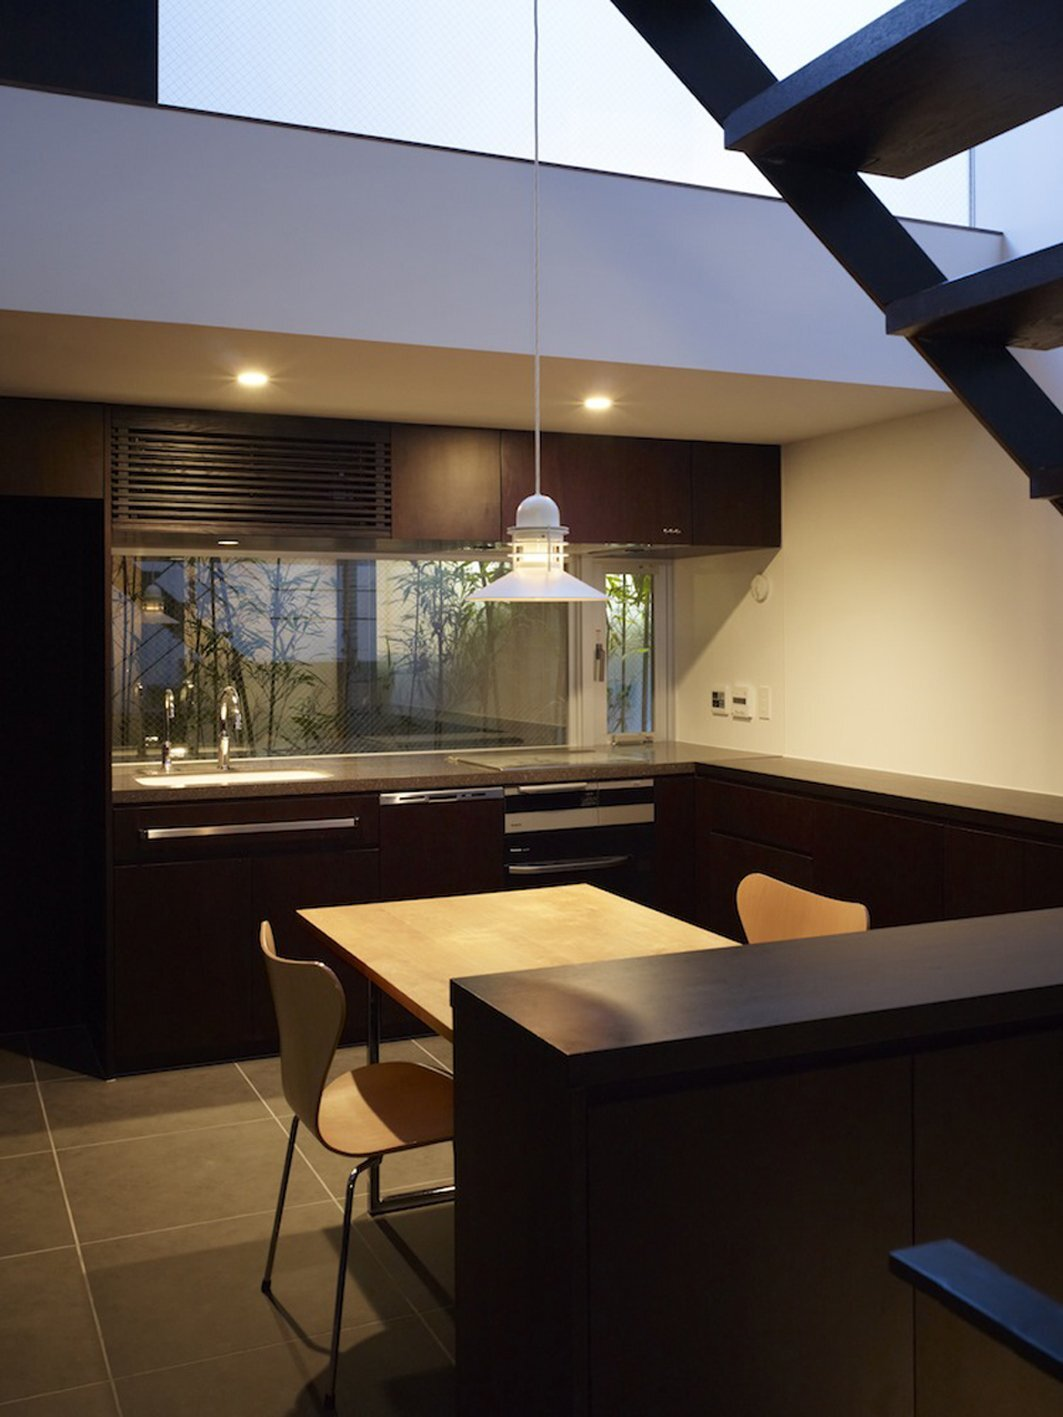 Shirokane House by MDS - Tokyo - Japan - Small House - Kitchen - Humble Homes